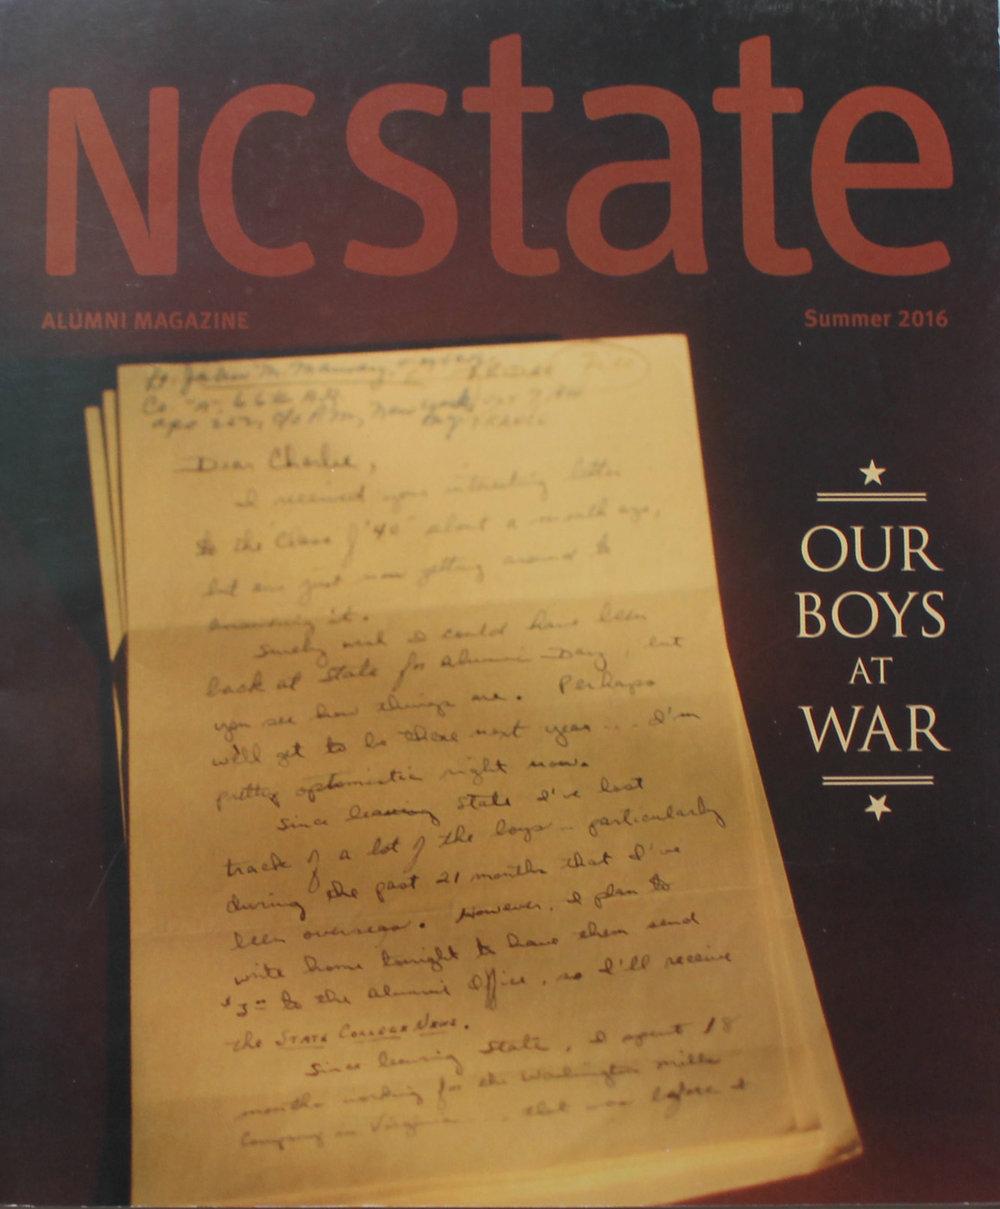 NCSU Cover.jpg